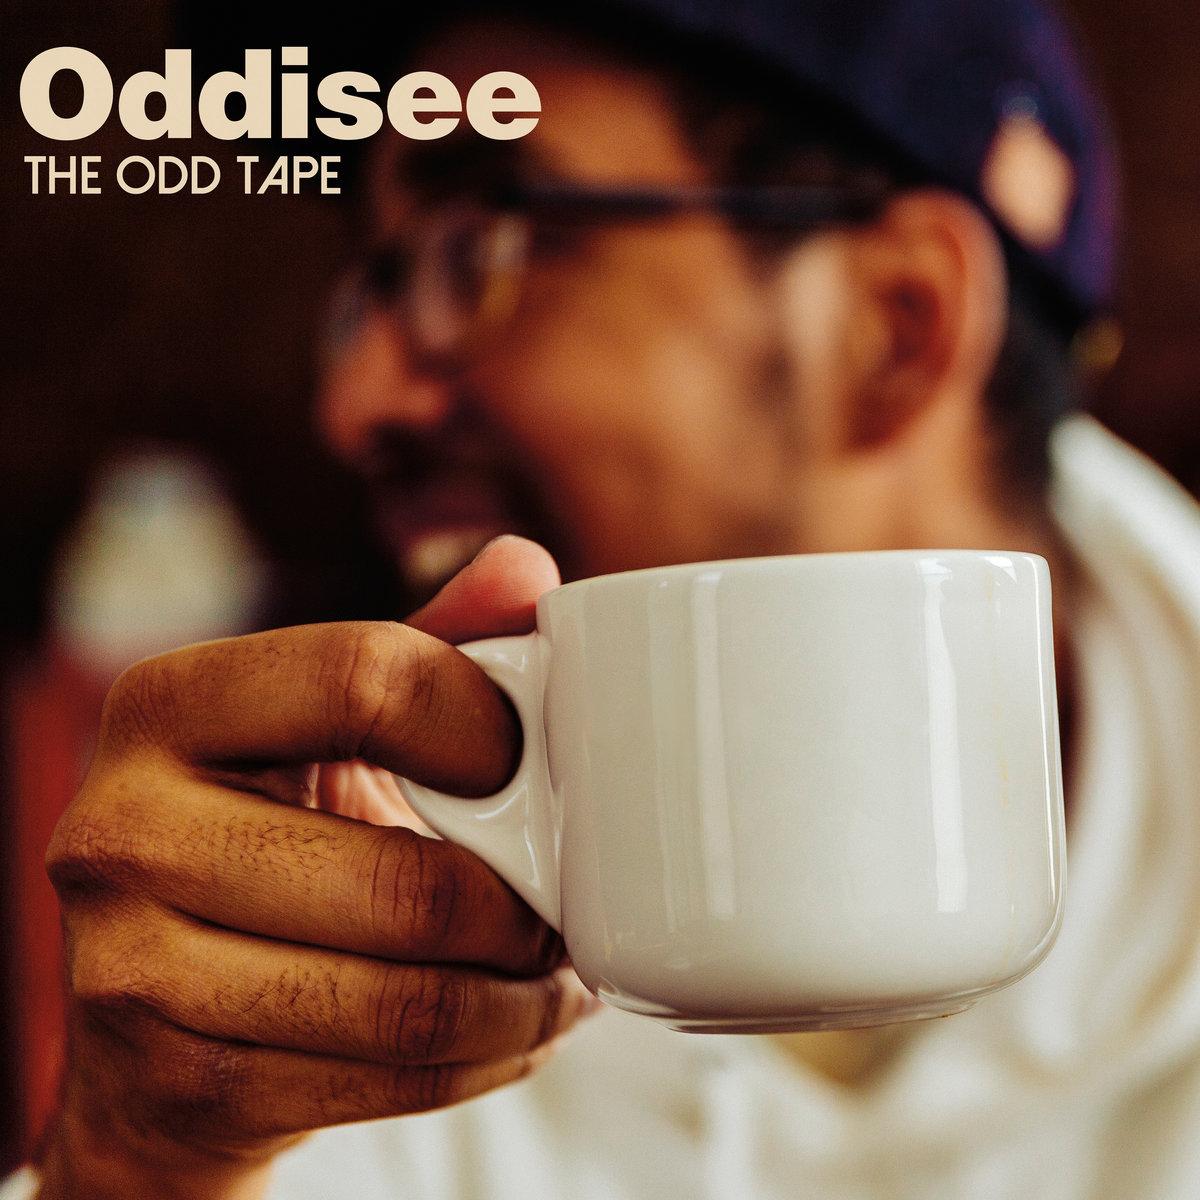 oddisee the odd tape